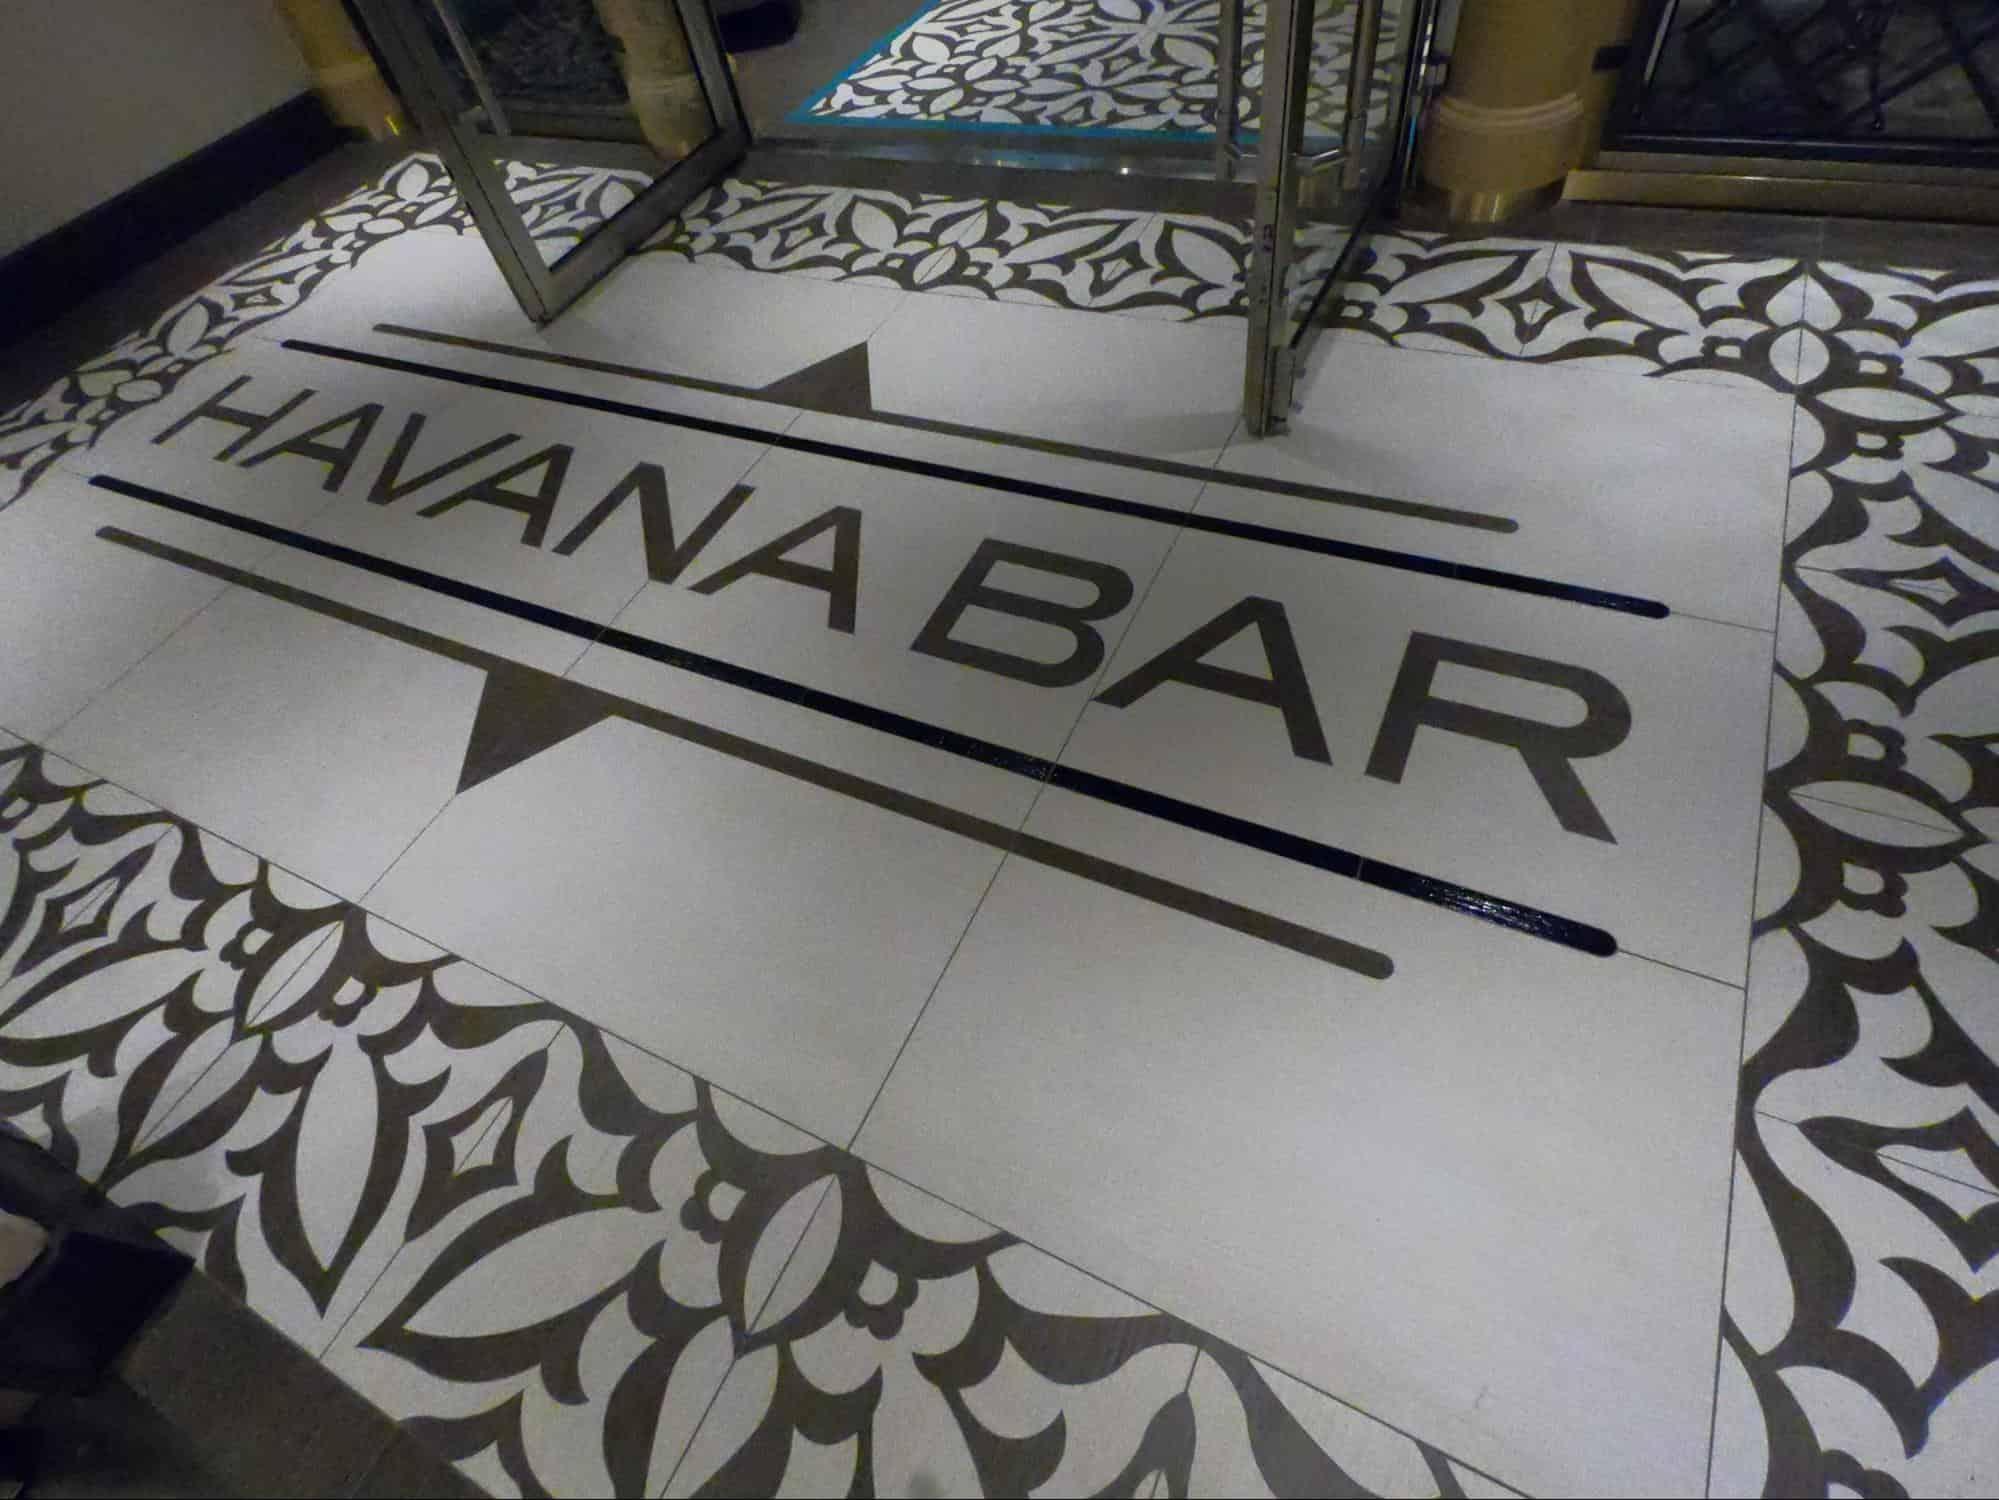 havana bar entrance